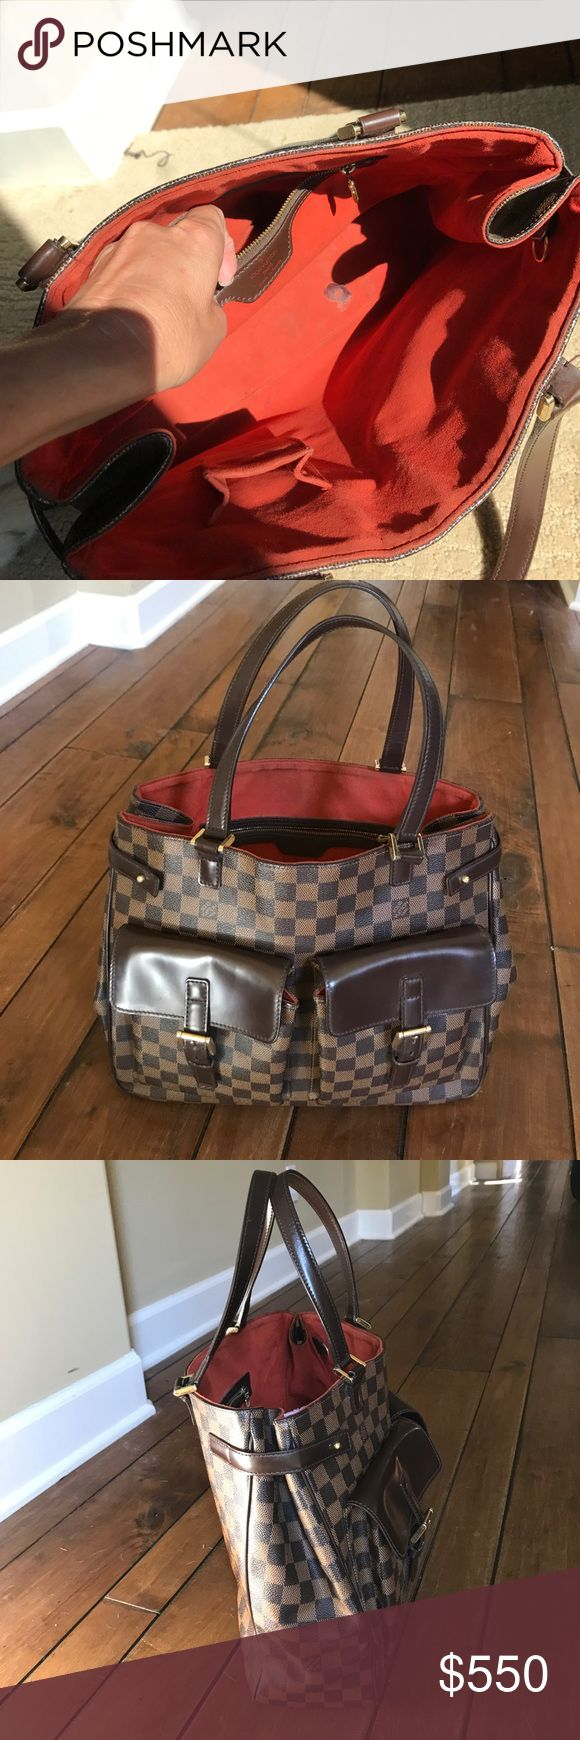 "Louis Vuitton Damier Ebene Canvas Uzes Authentic Louis Vuitton tote bag. In good condition. Spots inside(picture shown) and wear on outer corners. Dimensions 14""x12""x5""  Handle 8"" Louis Vuitton Bags Totes"